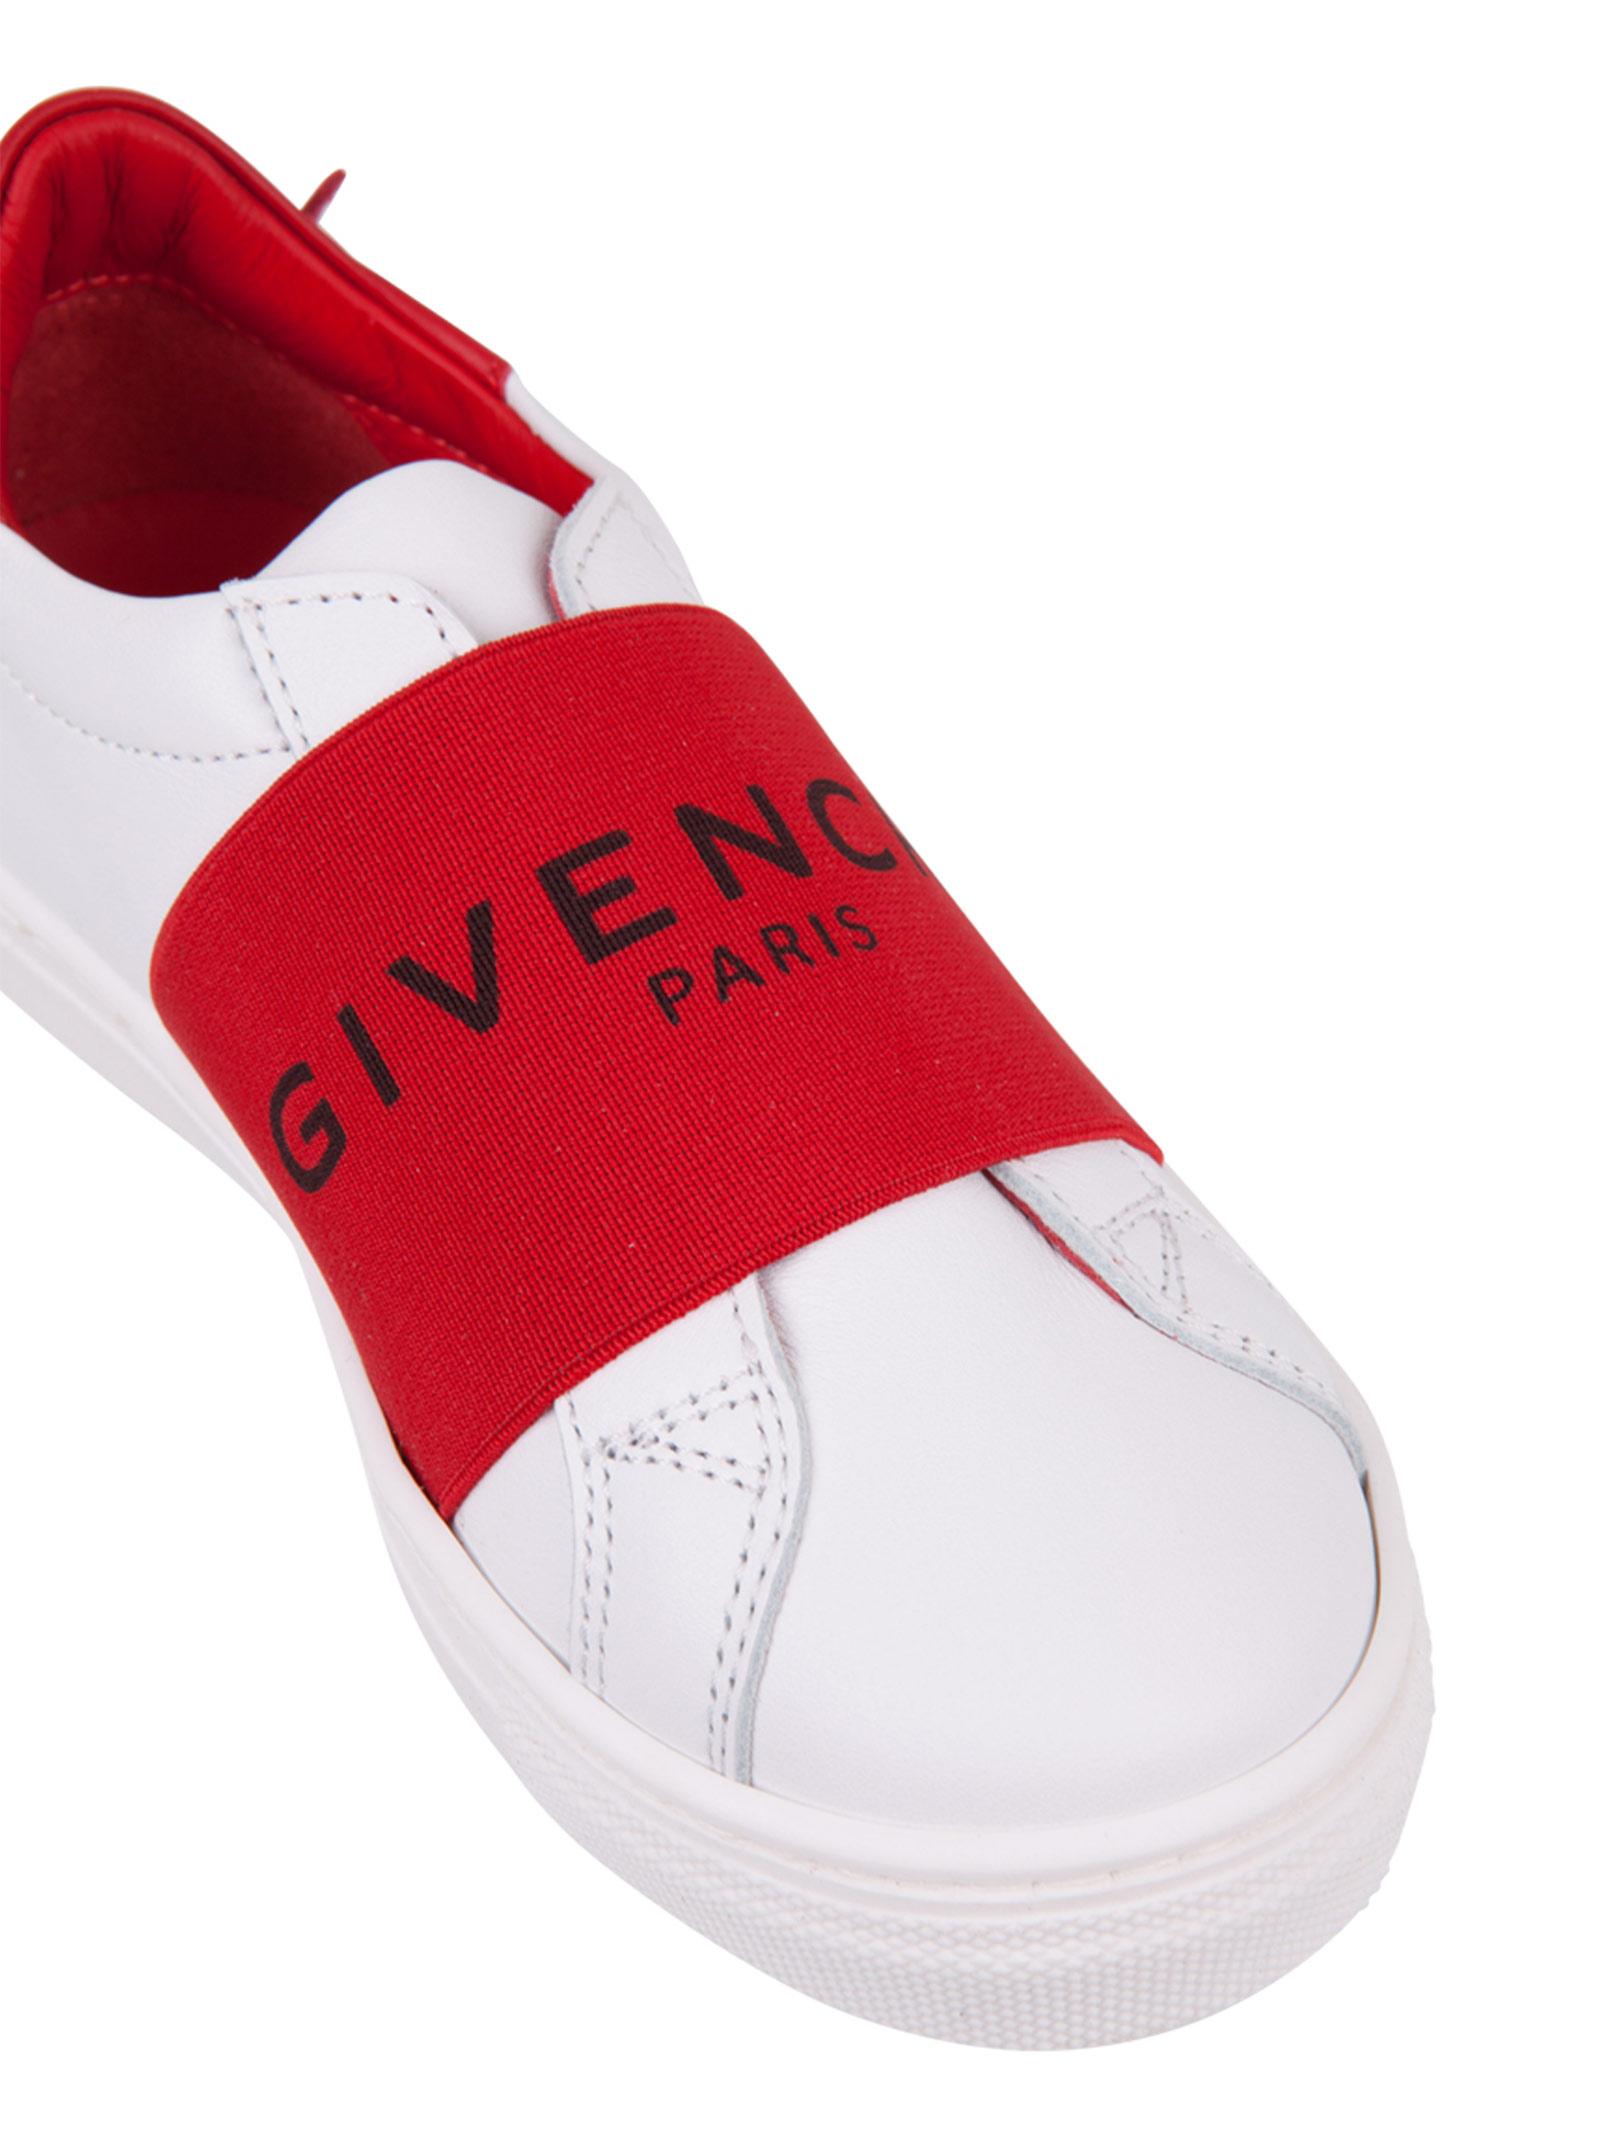 741eca0bda19 Givenchy Kids sneakers - GIVENCHY kids - Michele Franzese Moda